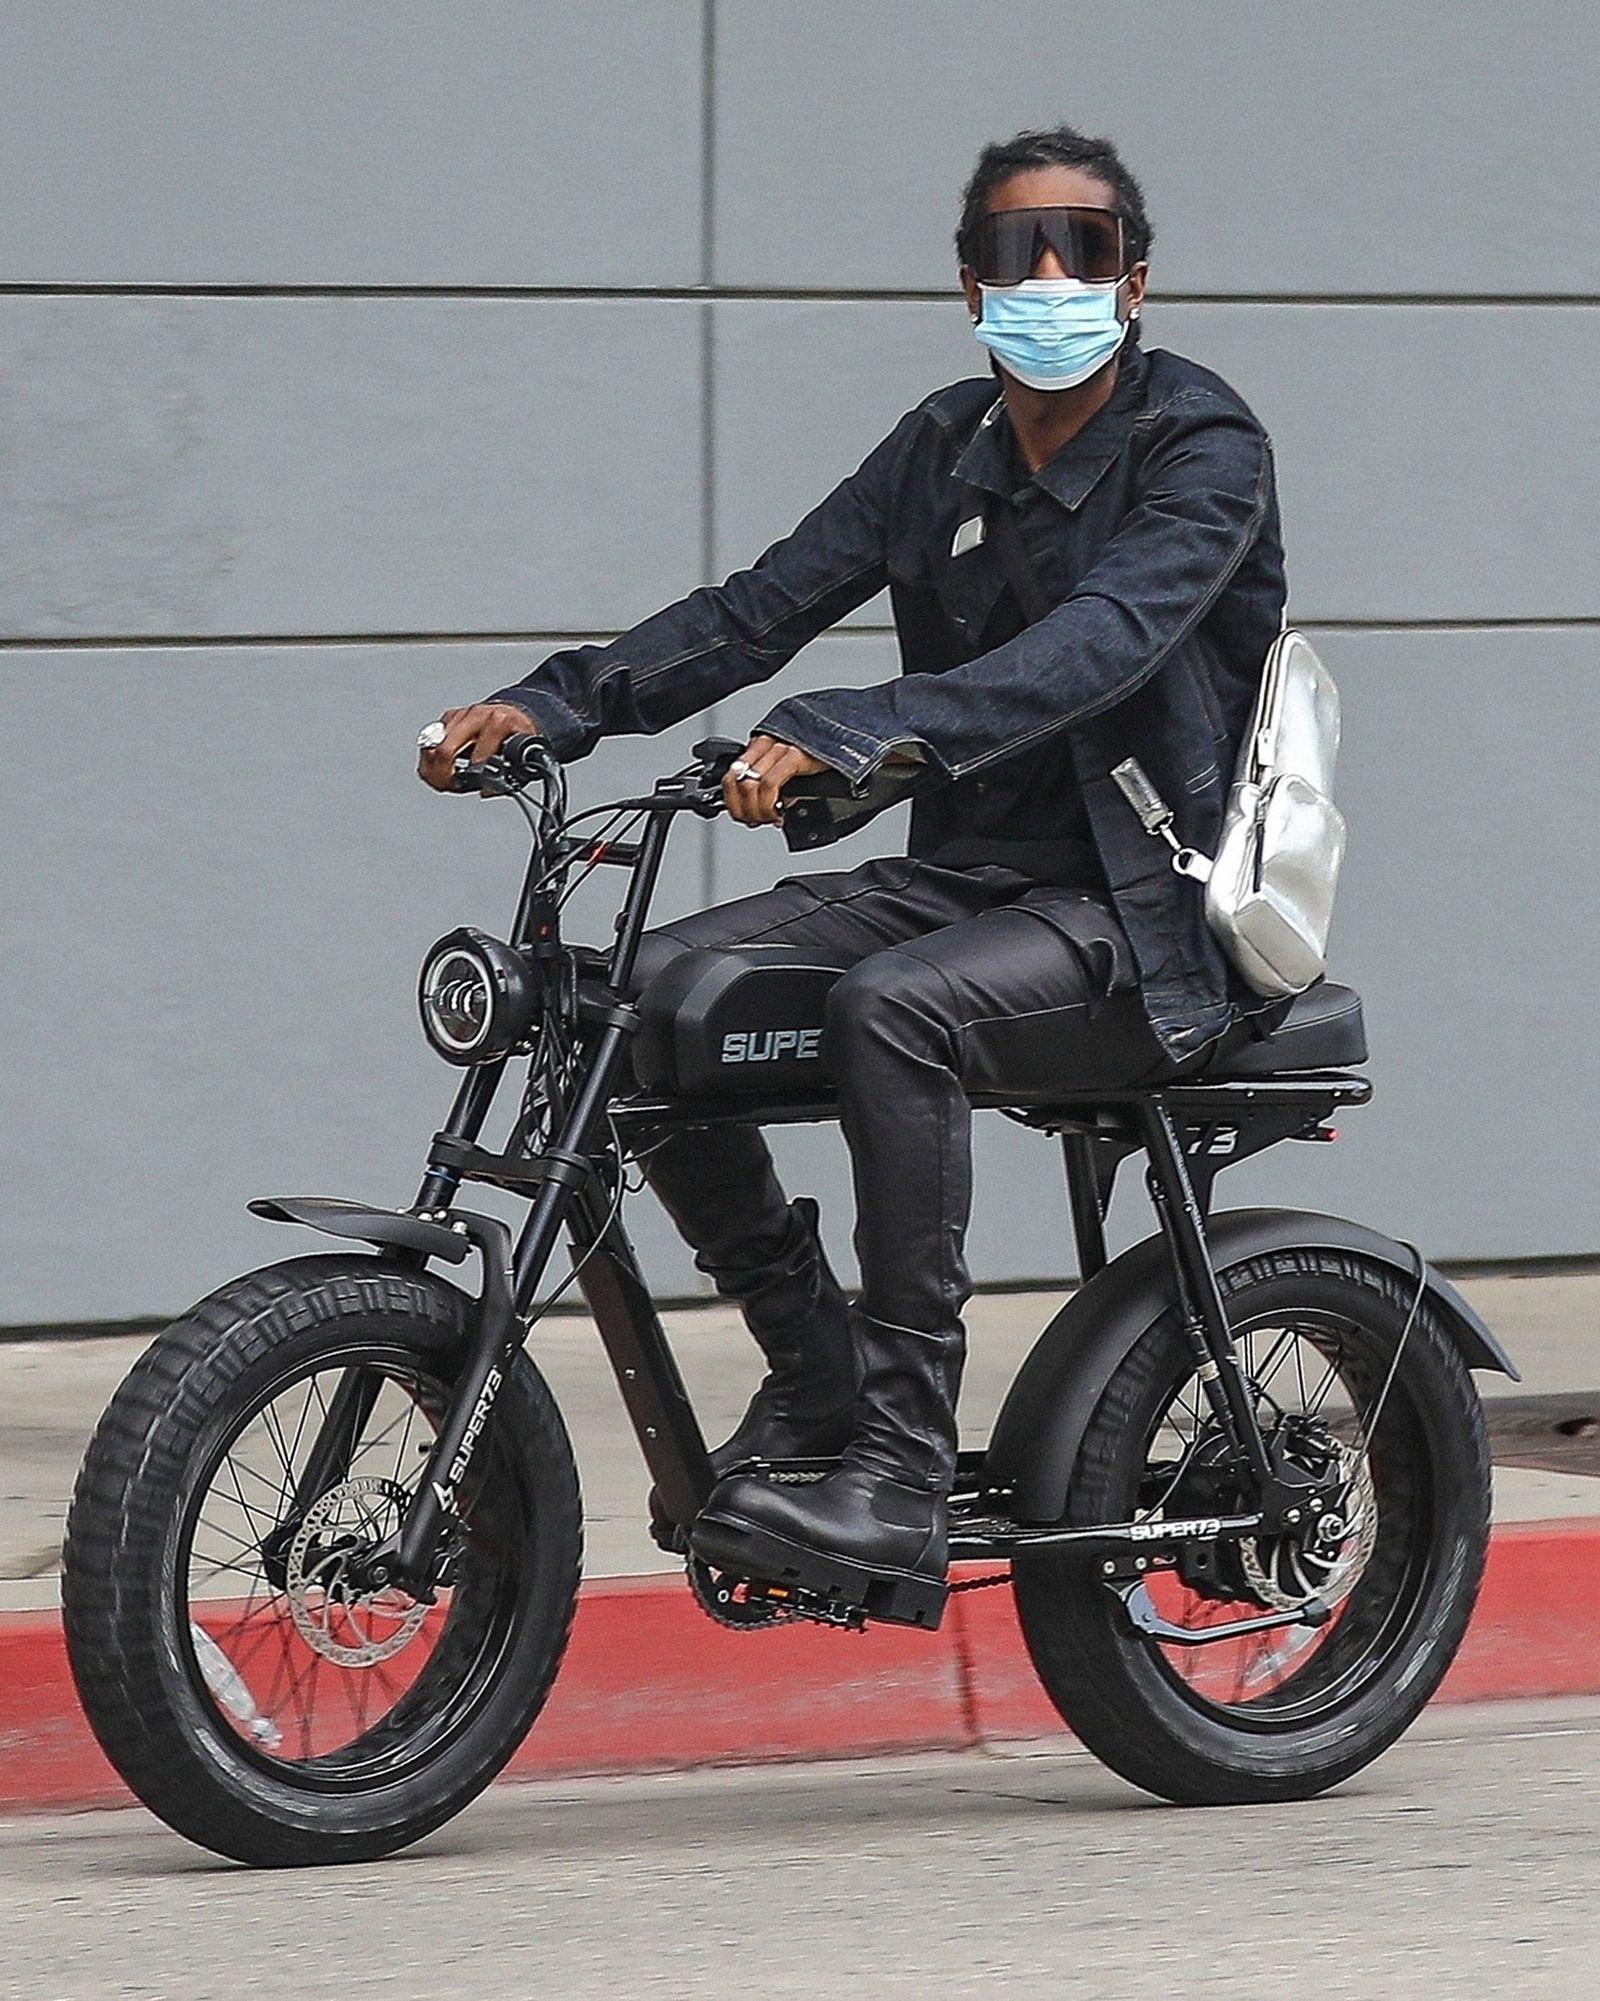 asap-rocky-bike-fit-01